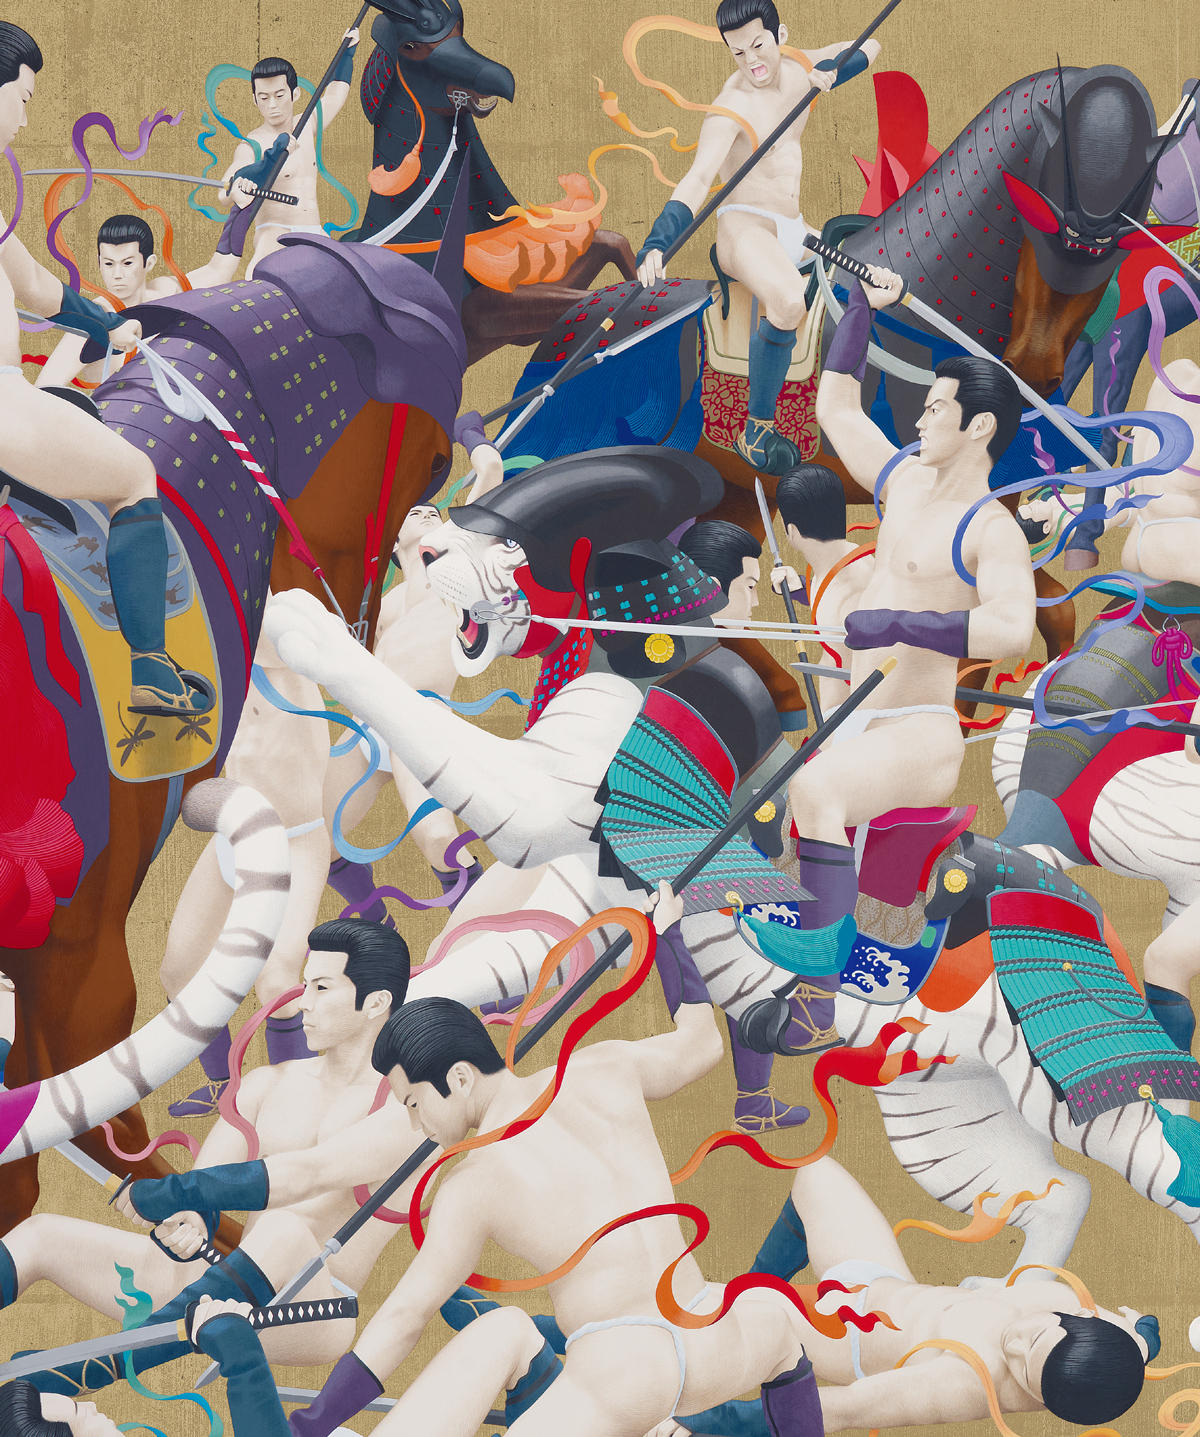 tenmyouya hisashi japanese painting 1